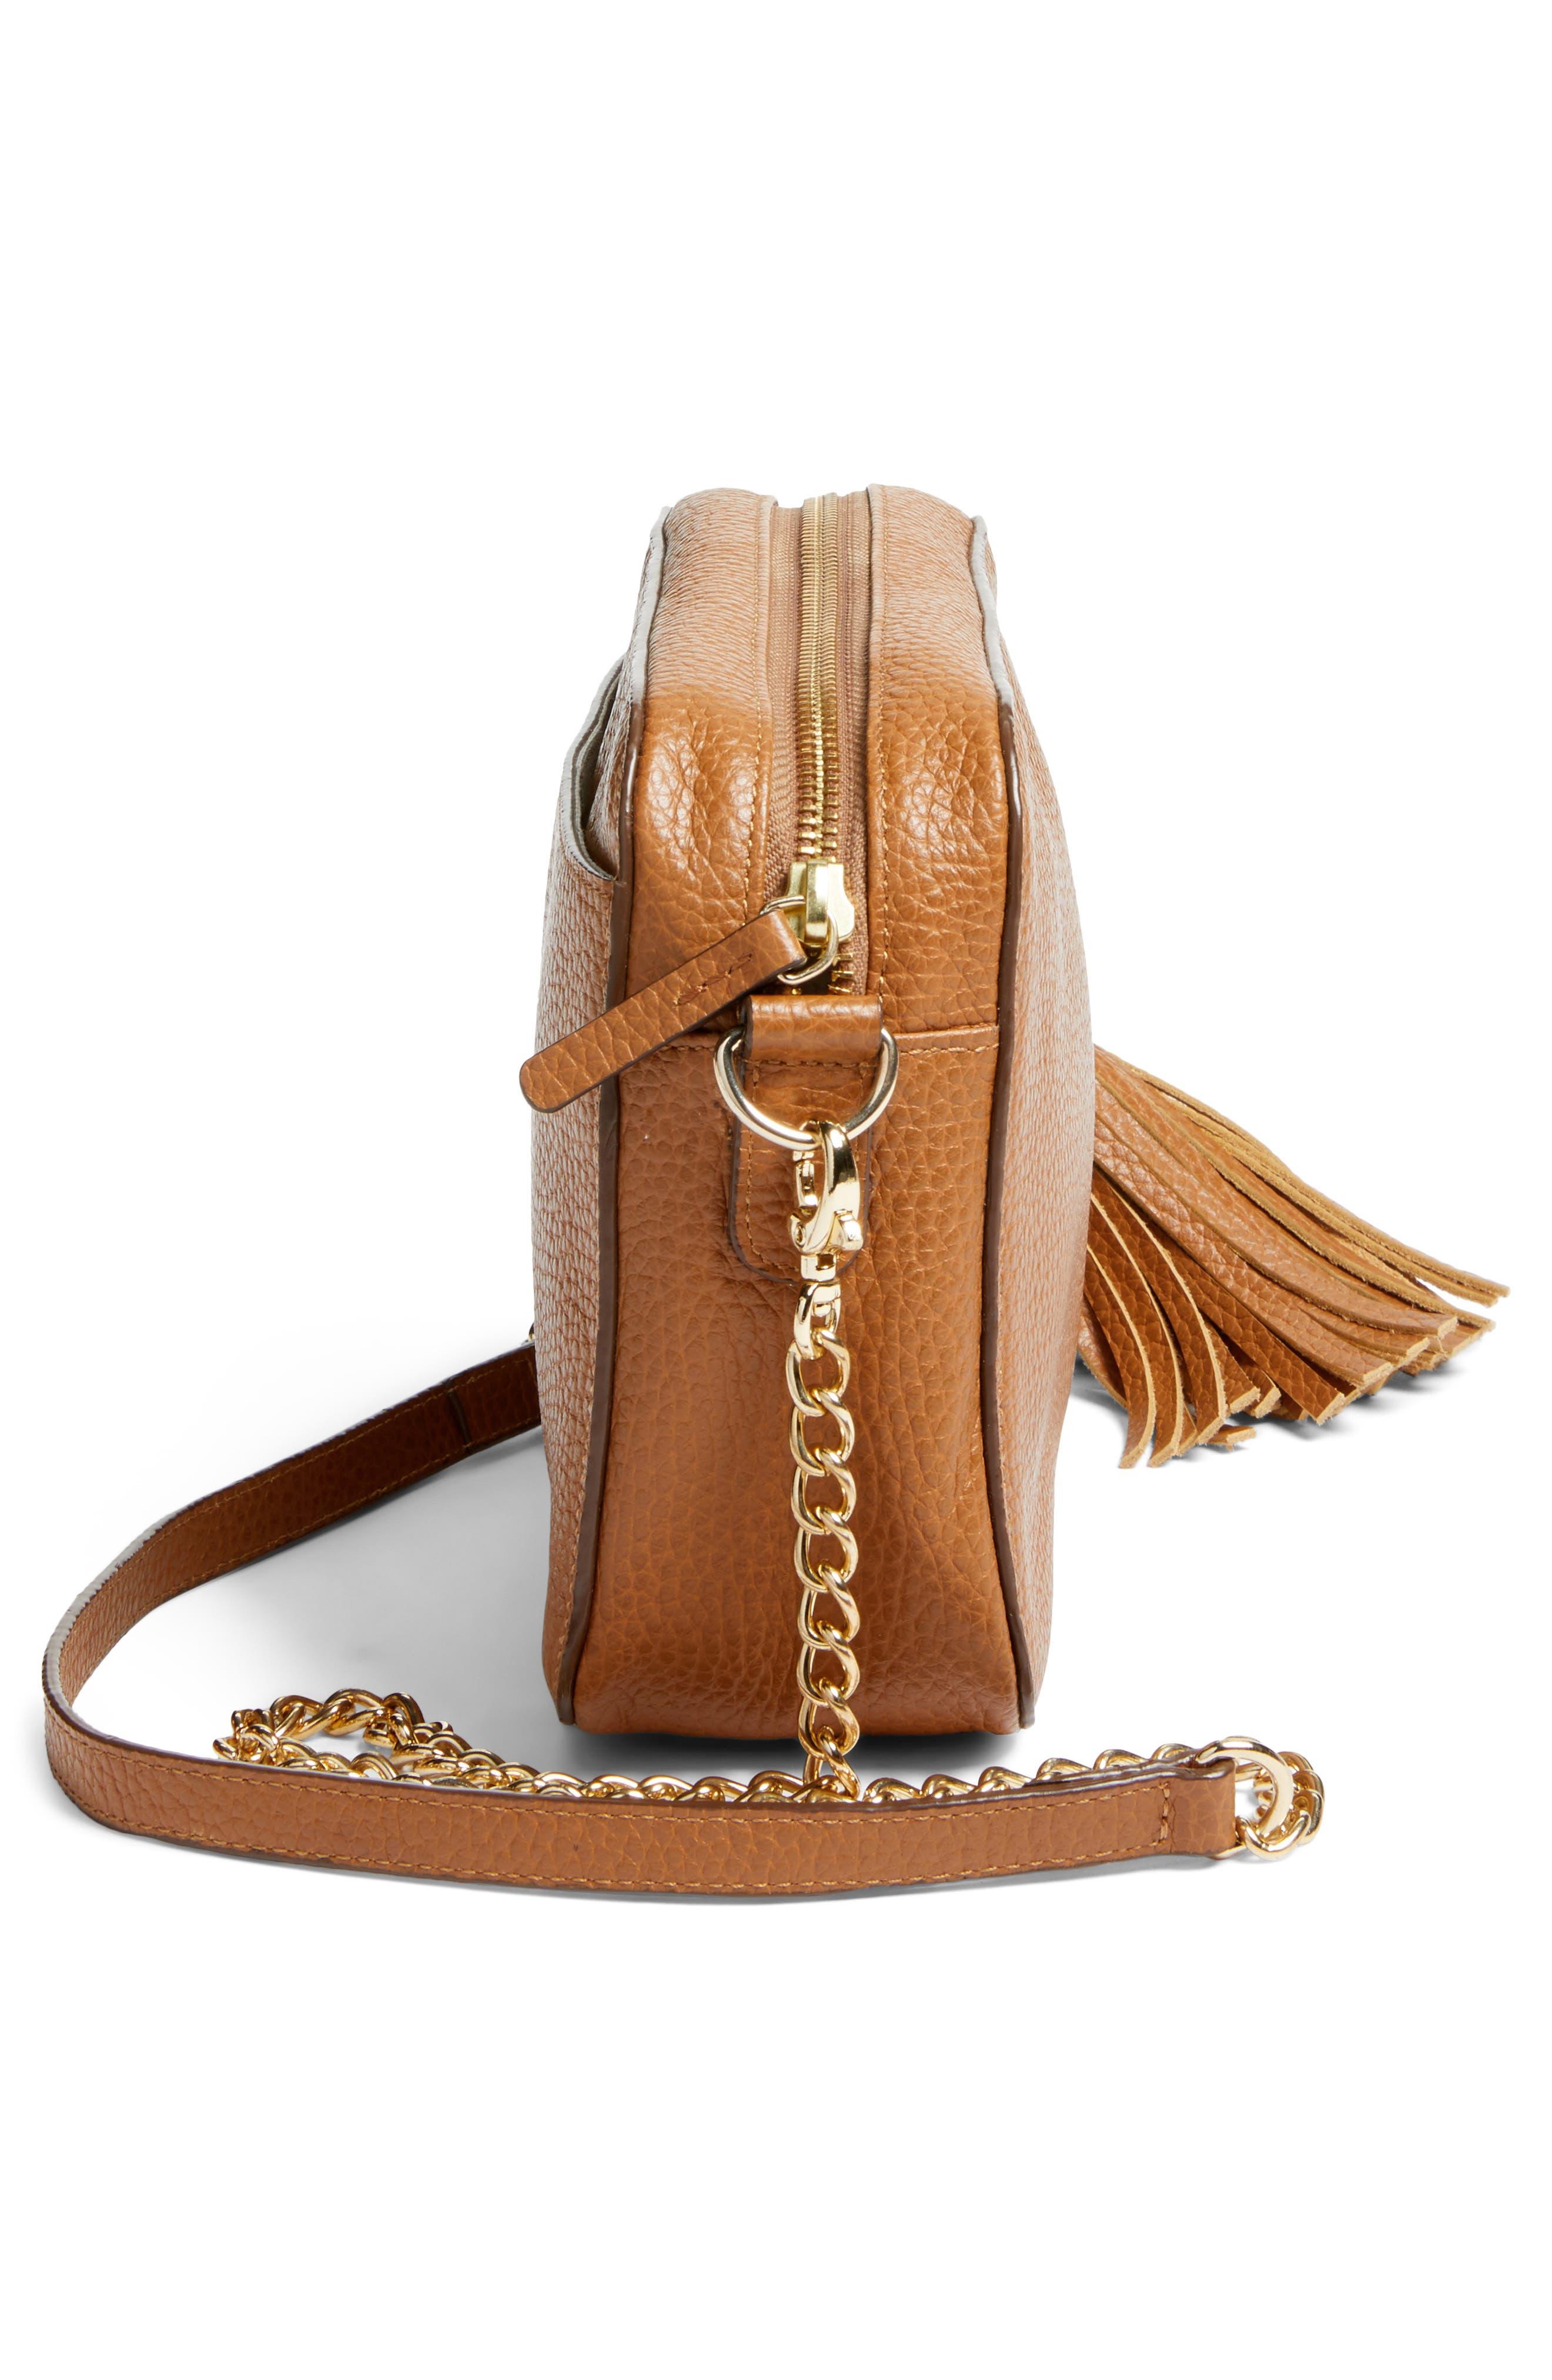 Ella Tassel Leather Crossbody Bag,                             Alternate thumbnail 5, color,                             Tan Spice